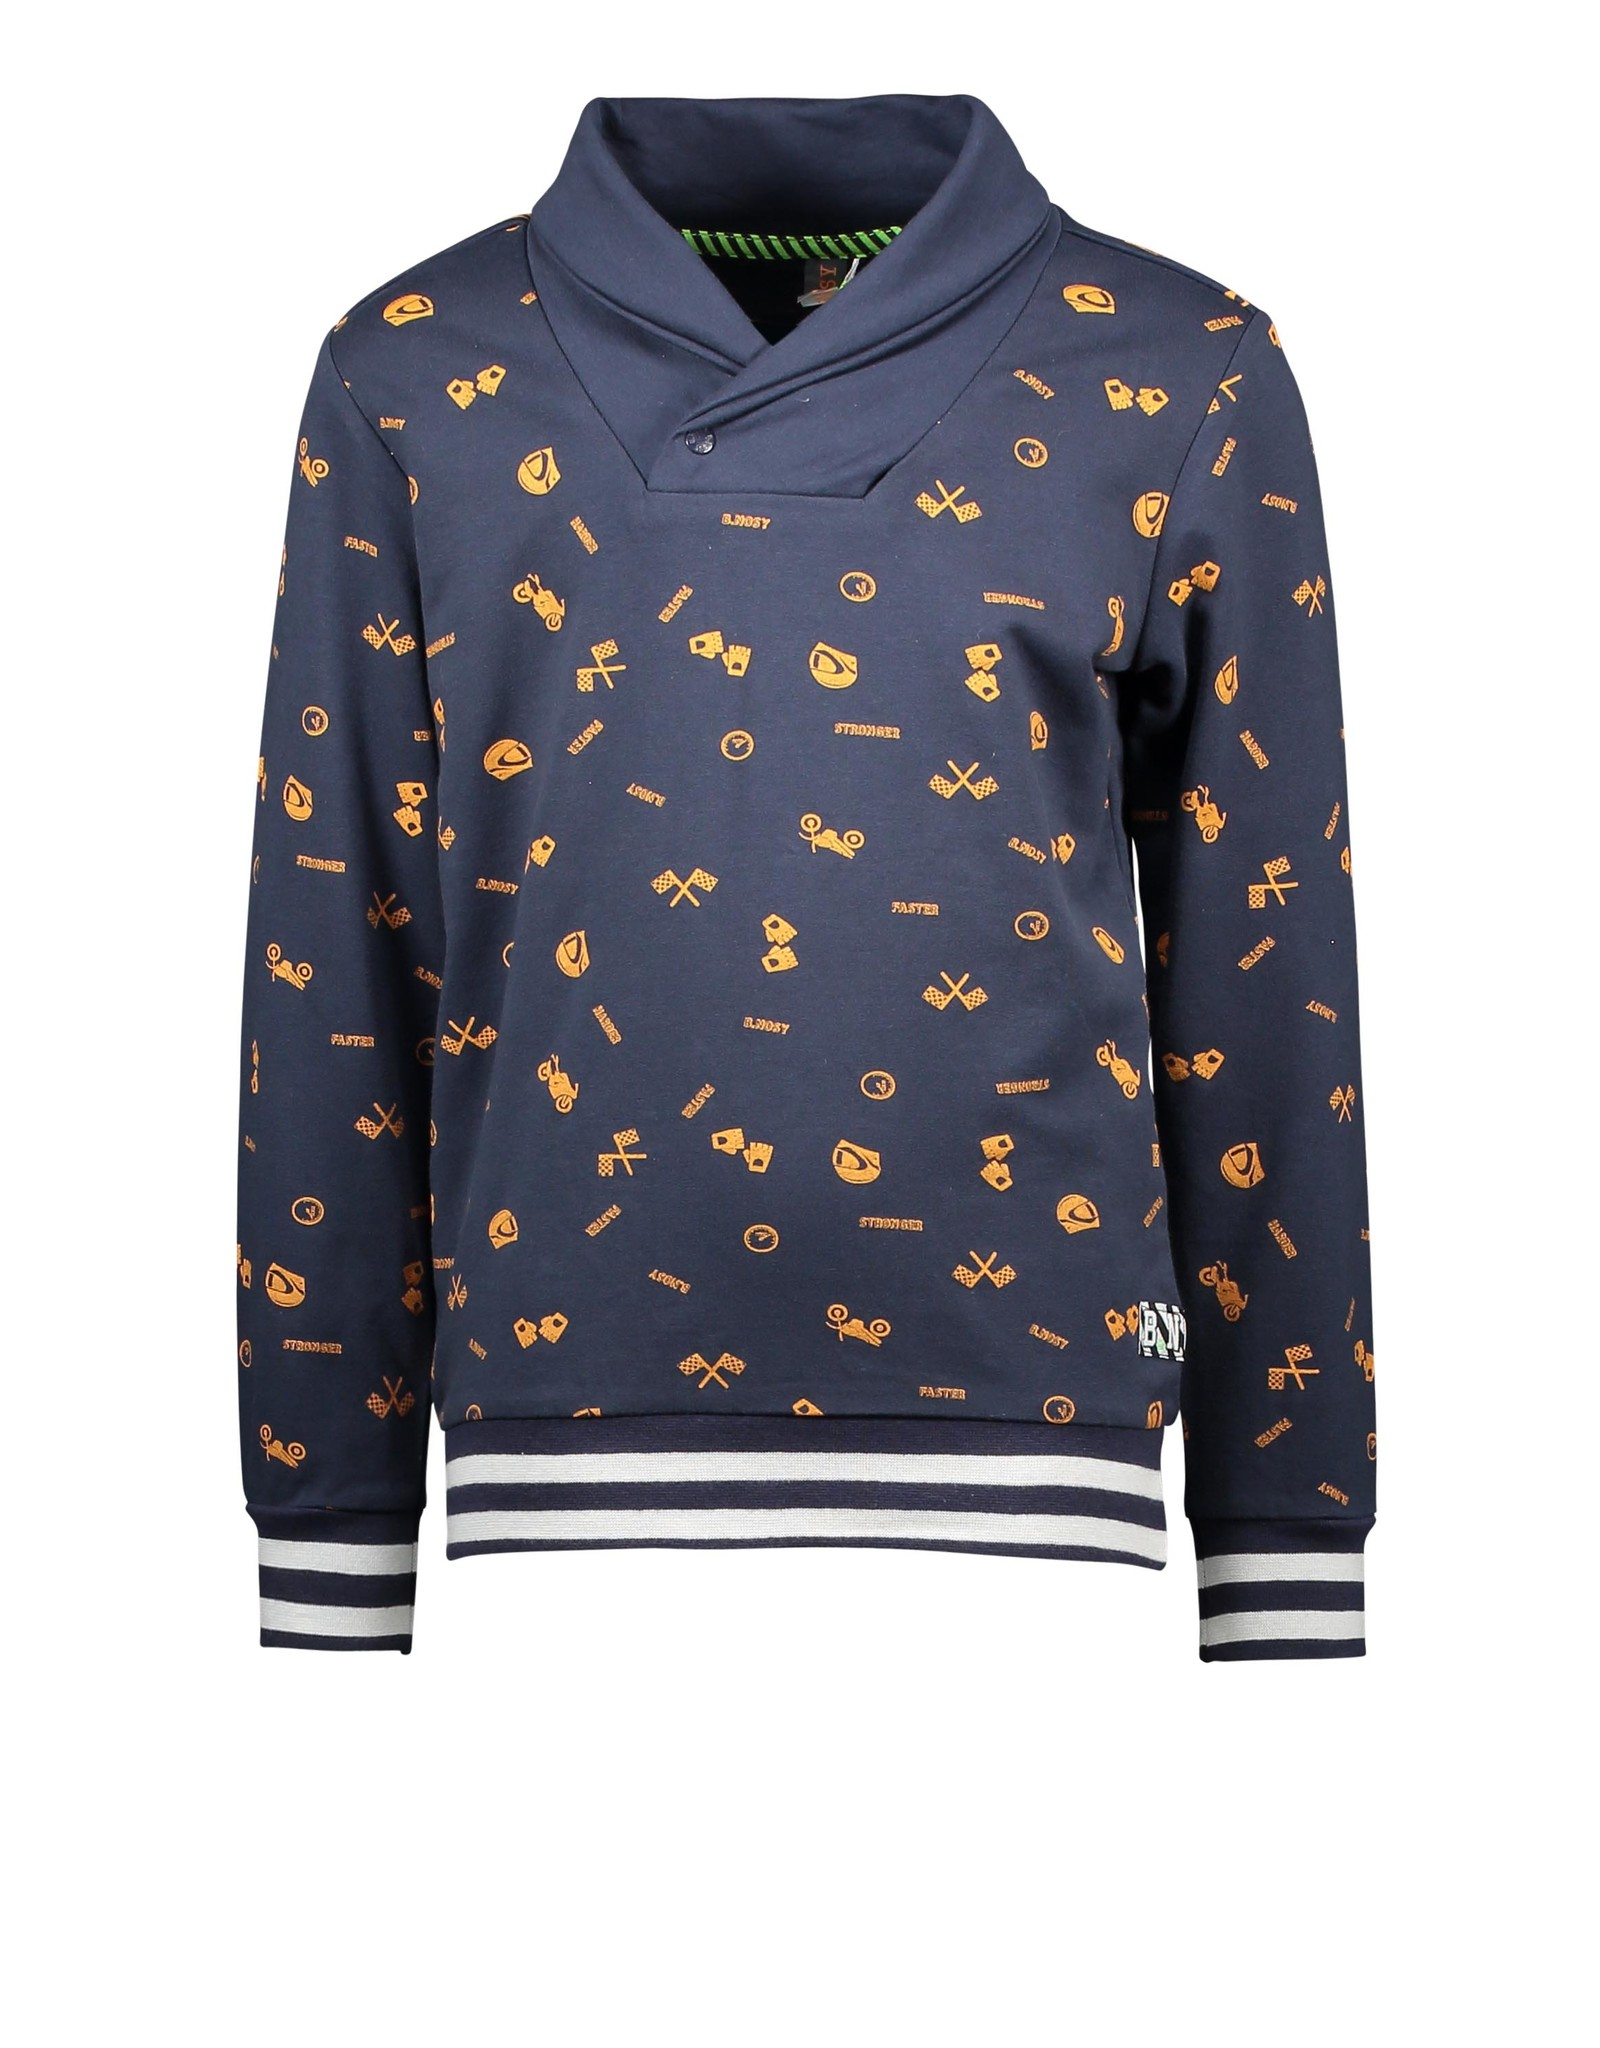 B-Nosy Boys aop race oak sweater with coll neck and stiped rib, Race oak aop